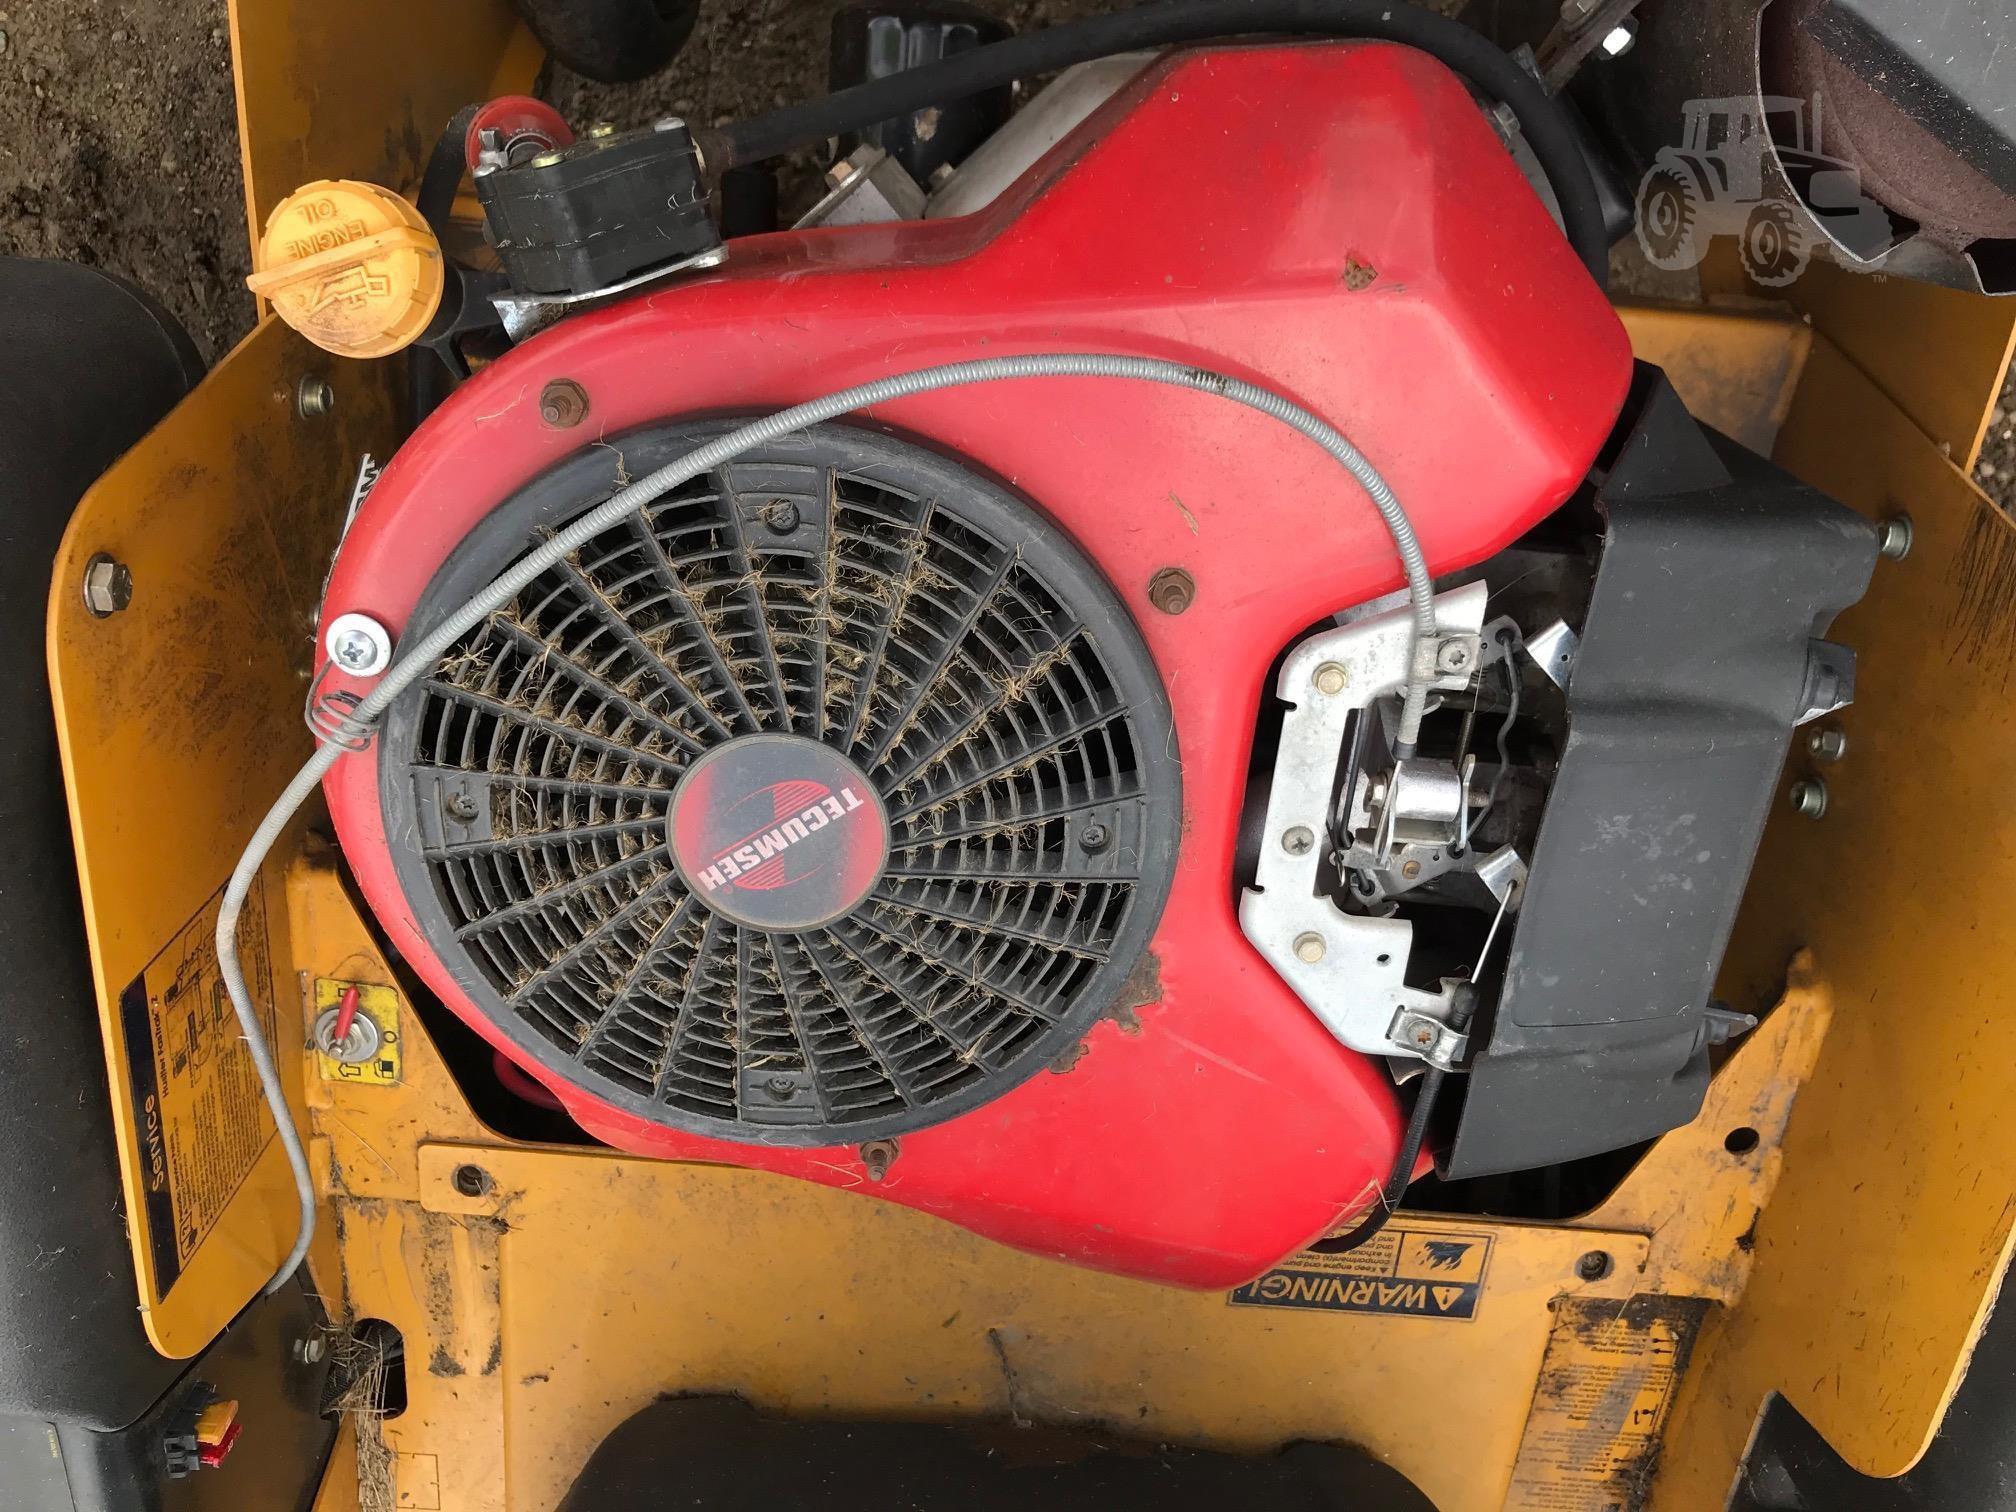 2021 Hustler Turf Equipment Super S 52 Kawasaki FX691 for